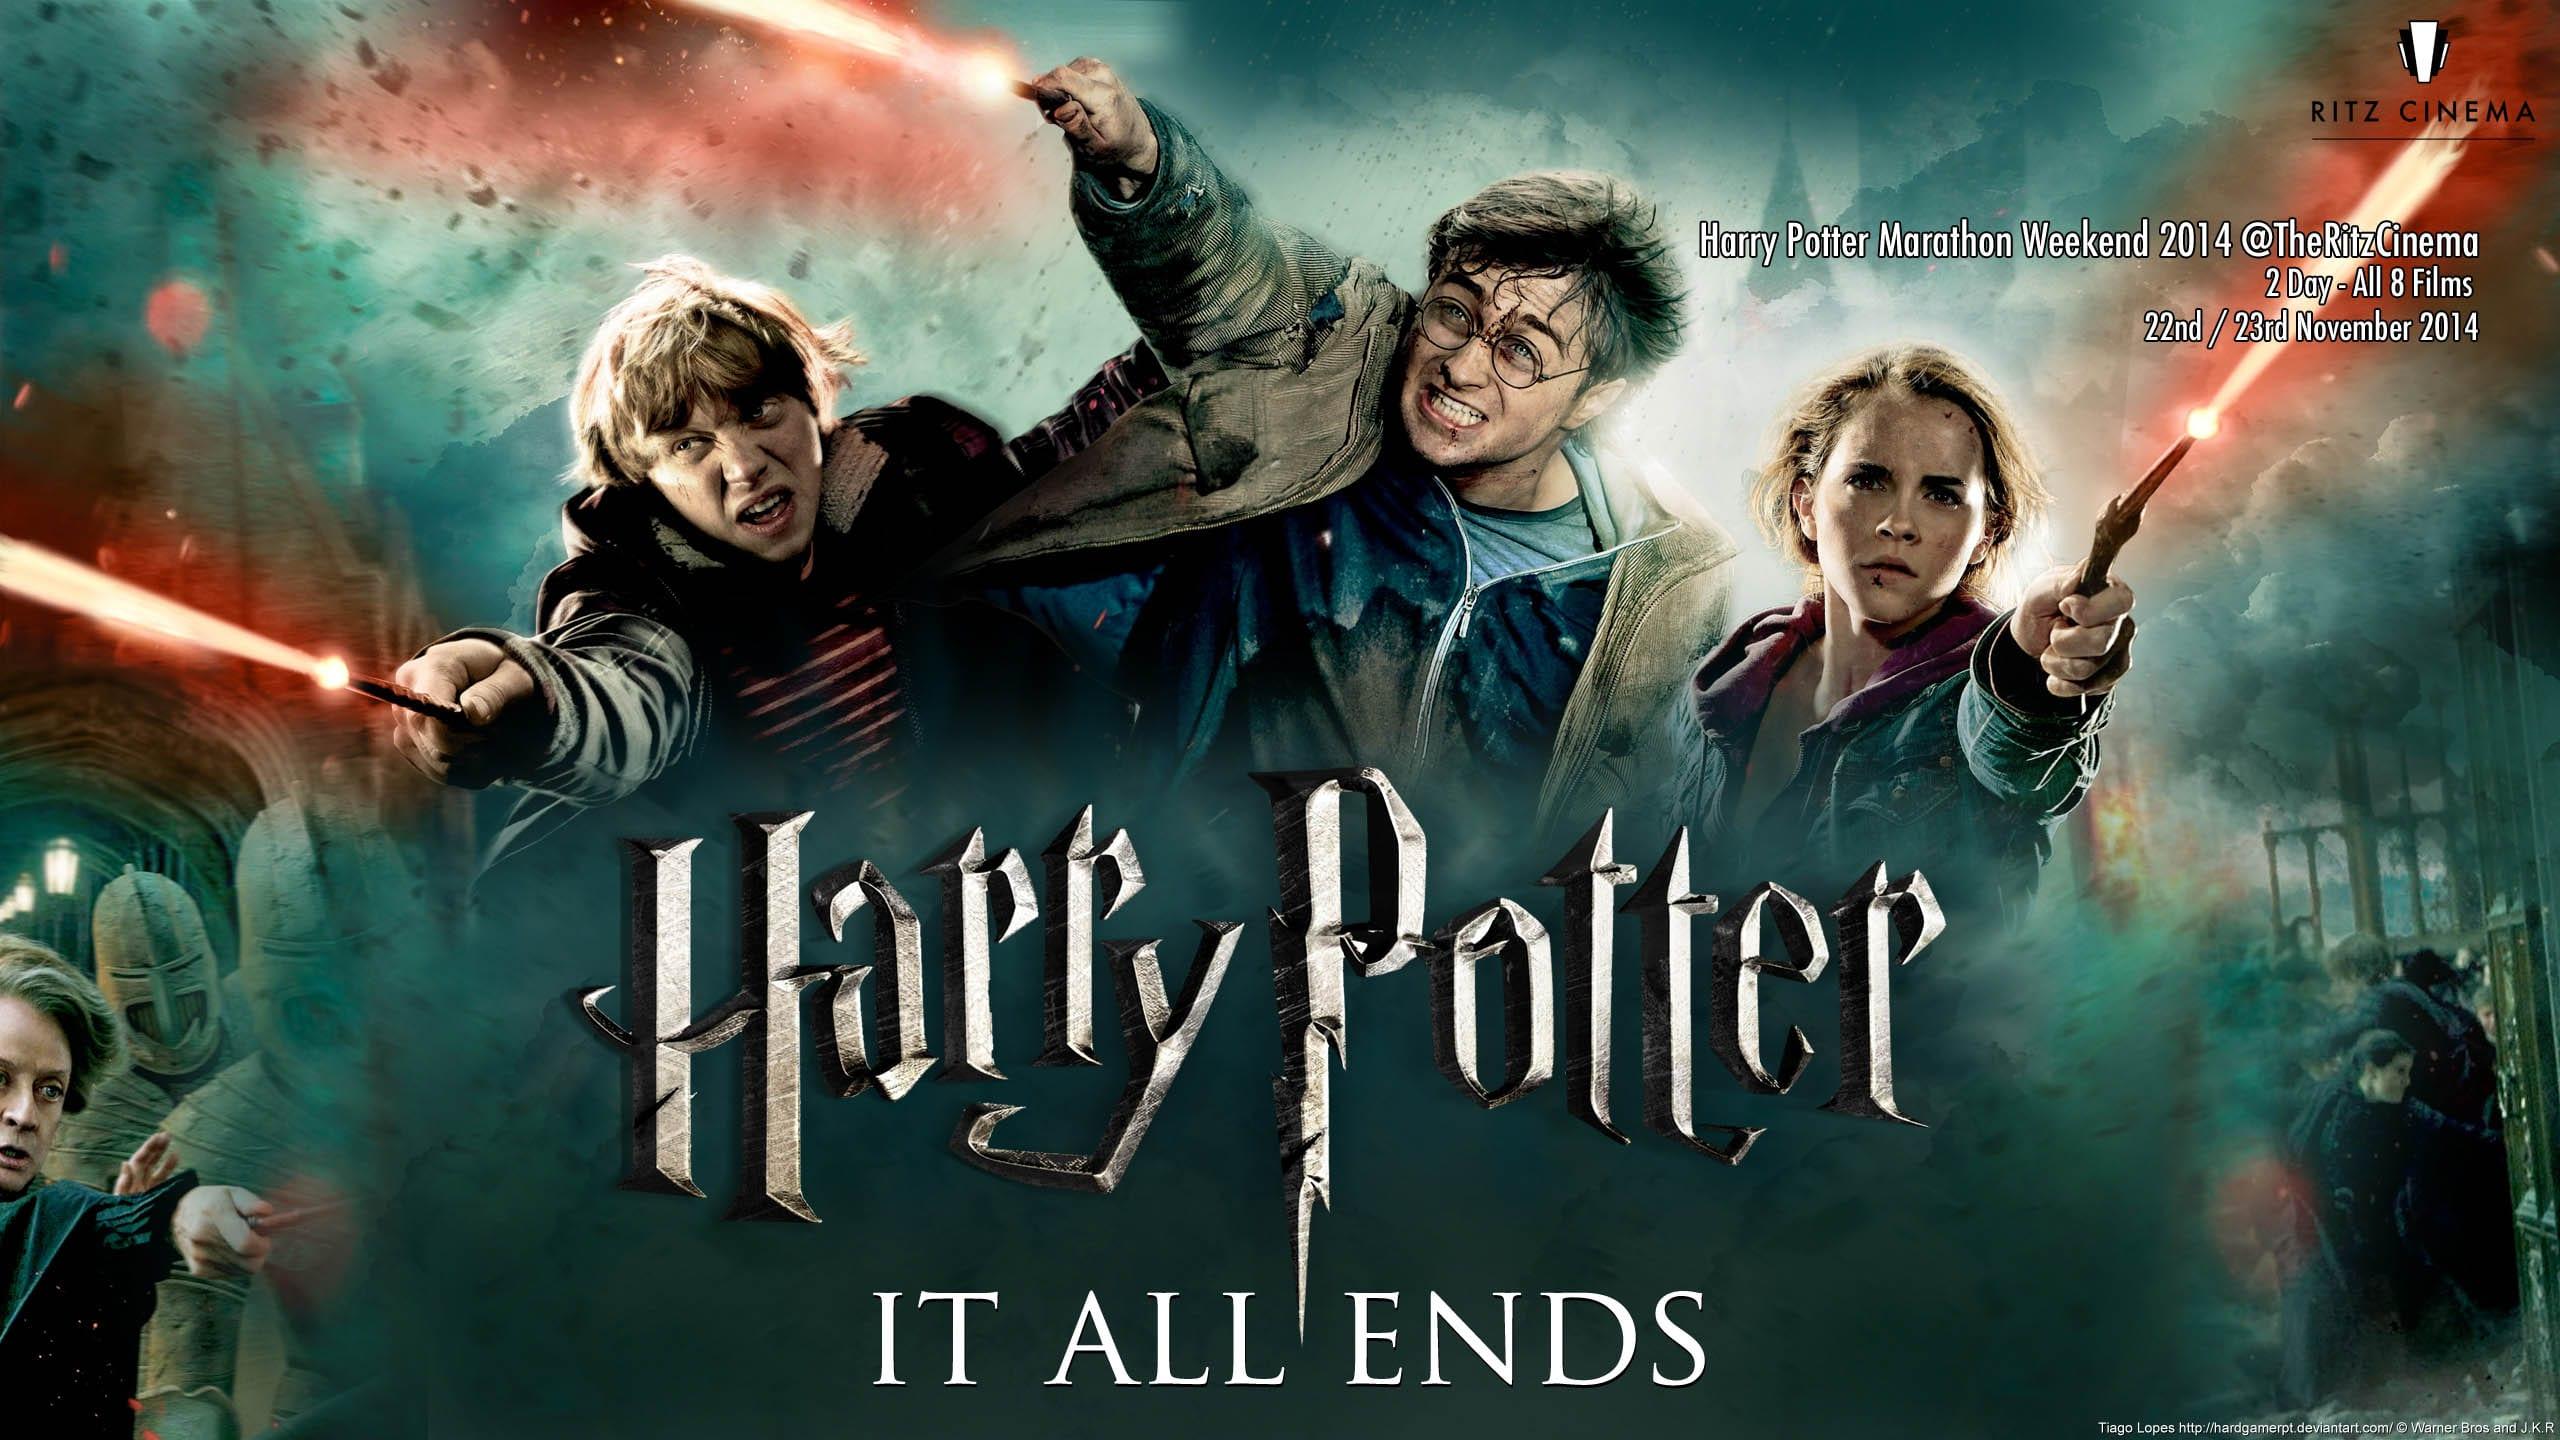 harrypottermarathon-1  sc 1 st  The Lincoln Mail & The Ritz opens itu0027s Griffin-doors for Harry Potter marathon.   The ...